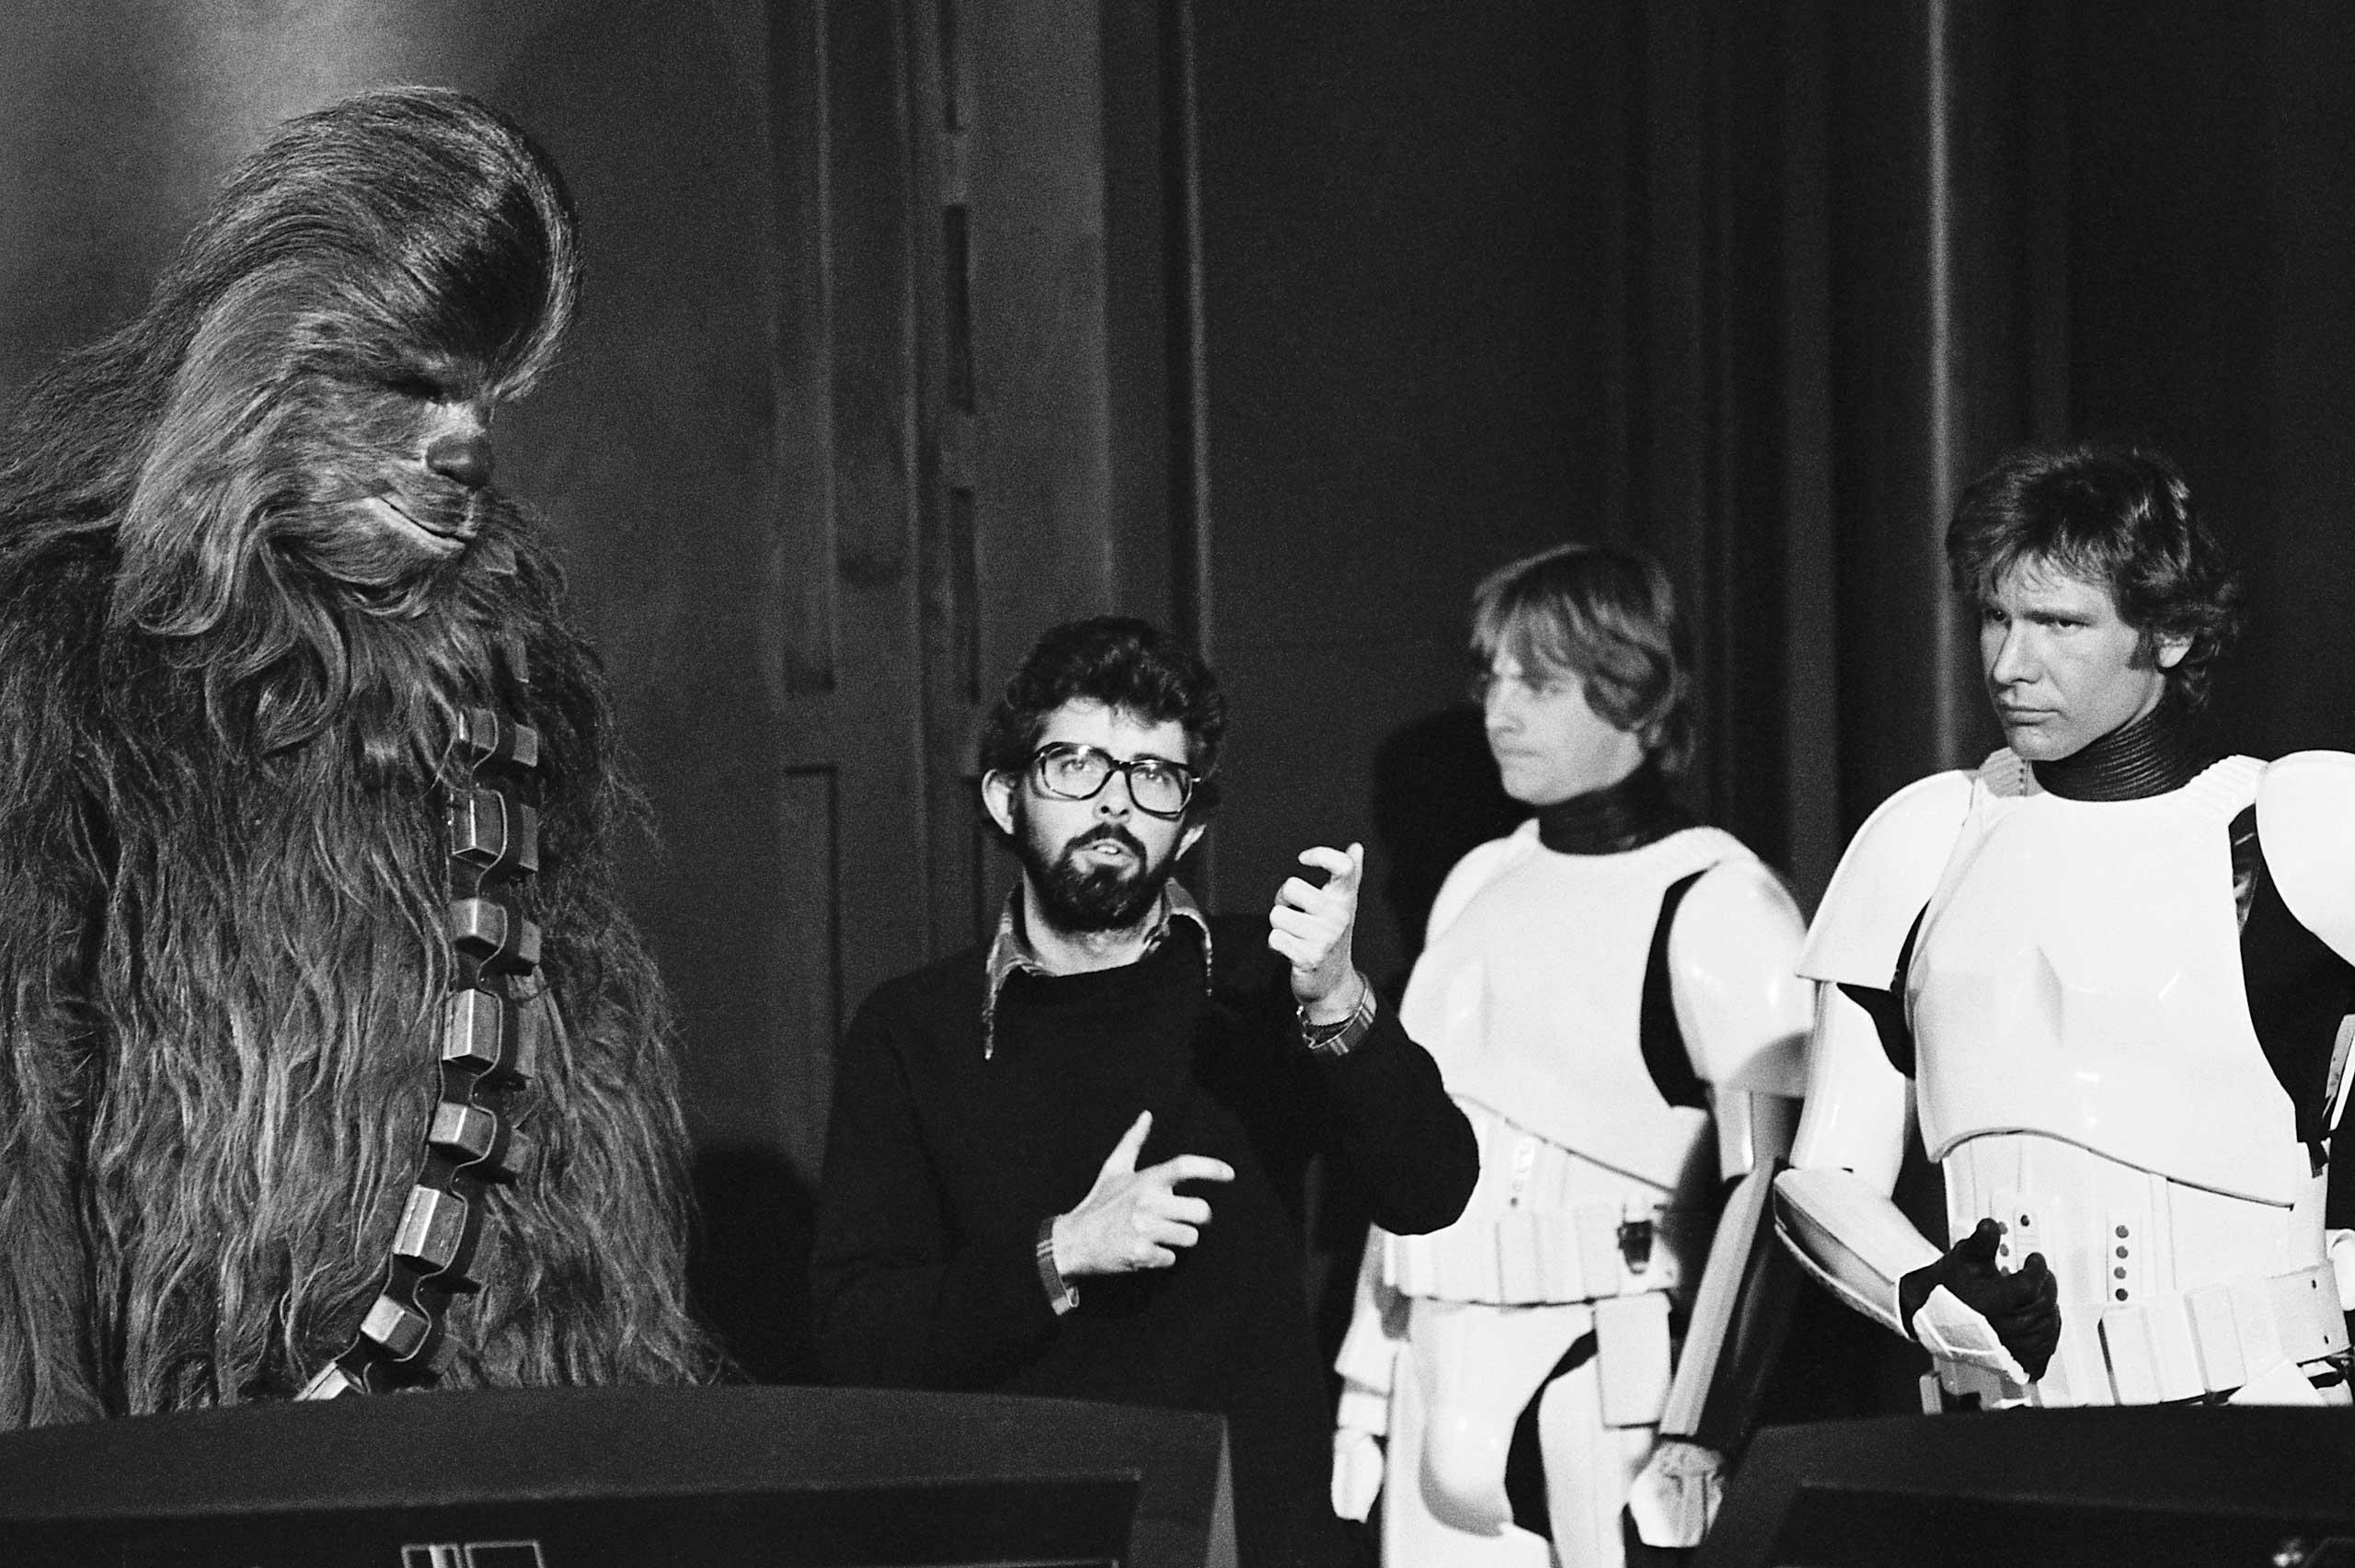 Harrison Ford on Star Wars set